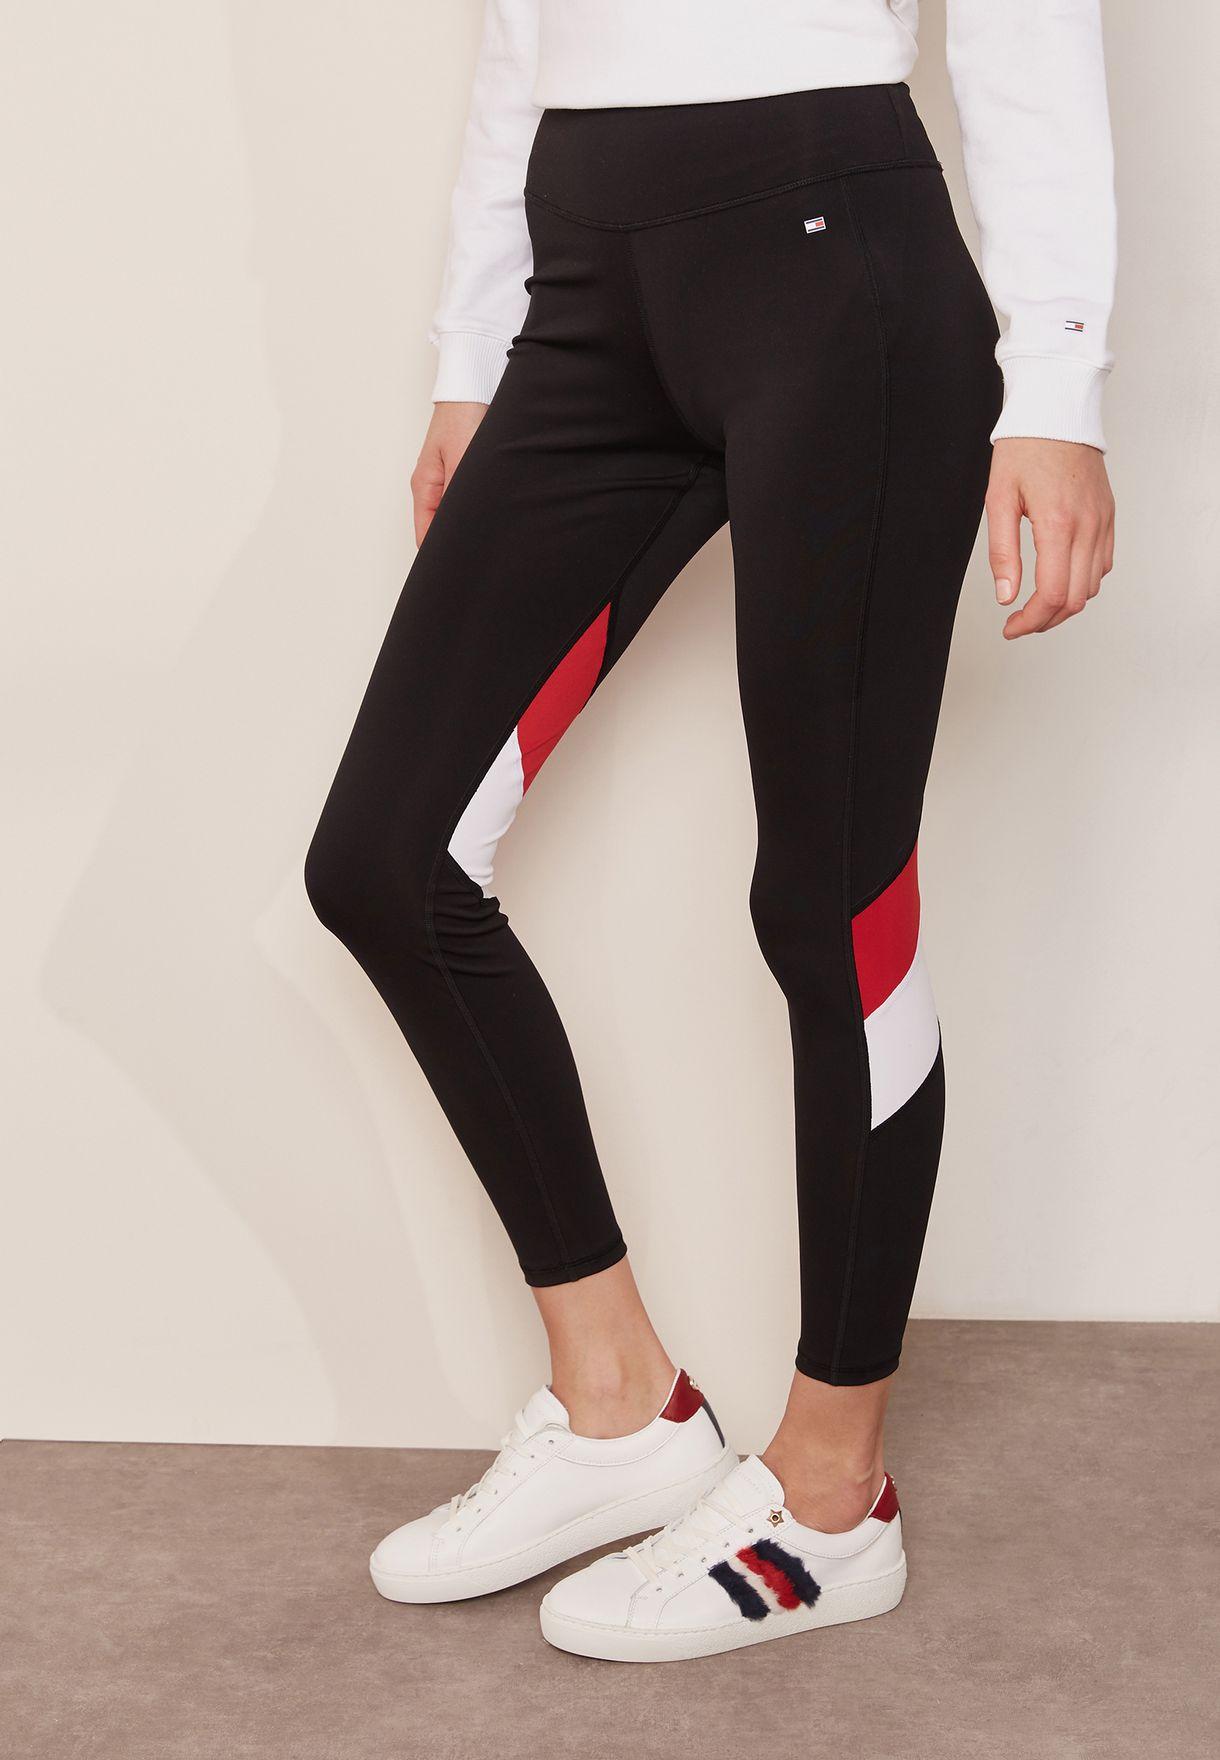 6f10fe186353b Shop Tommy Hilfiger black High Waist Contrast Leggings WW0WW21725 for Women  in UAE - TO279AT62LSN